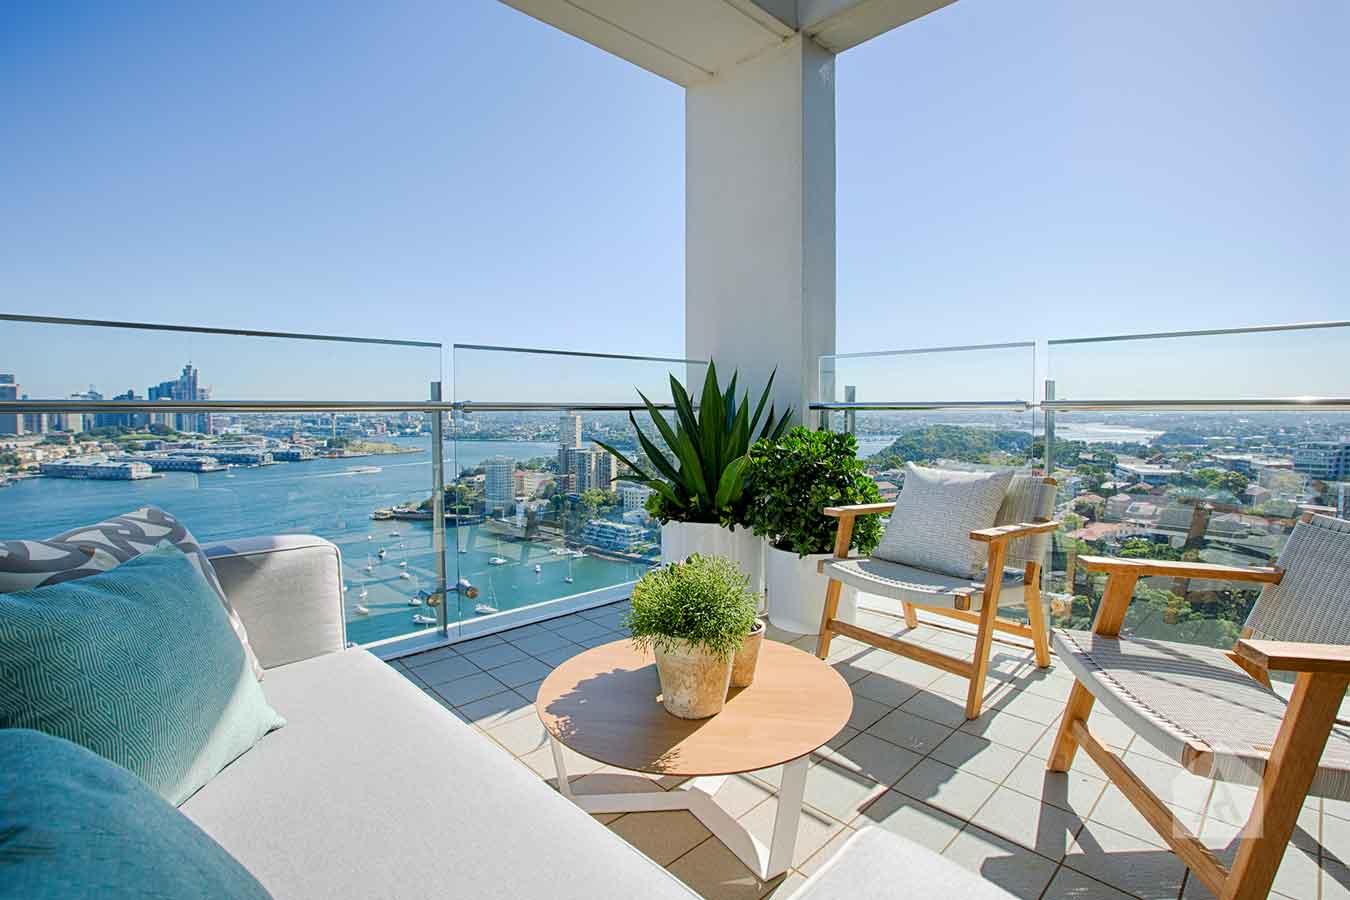 ©-Adam-Robinson-Design-Milson's-Point-Balcony-by-Chanelle-Ockenden-08.jpg